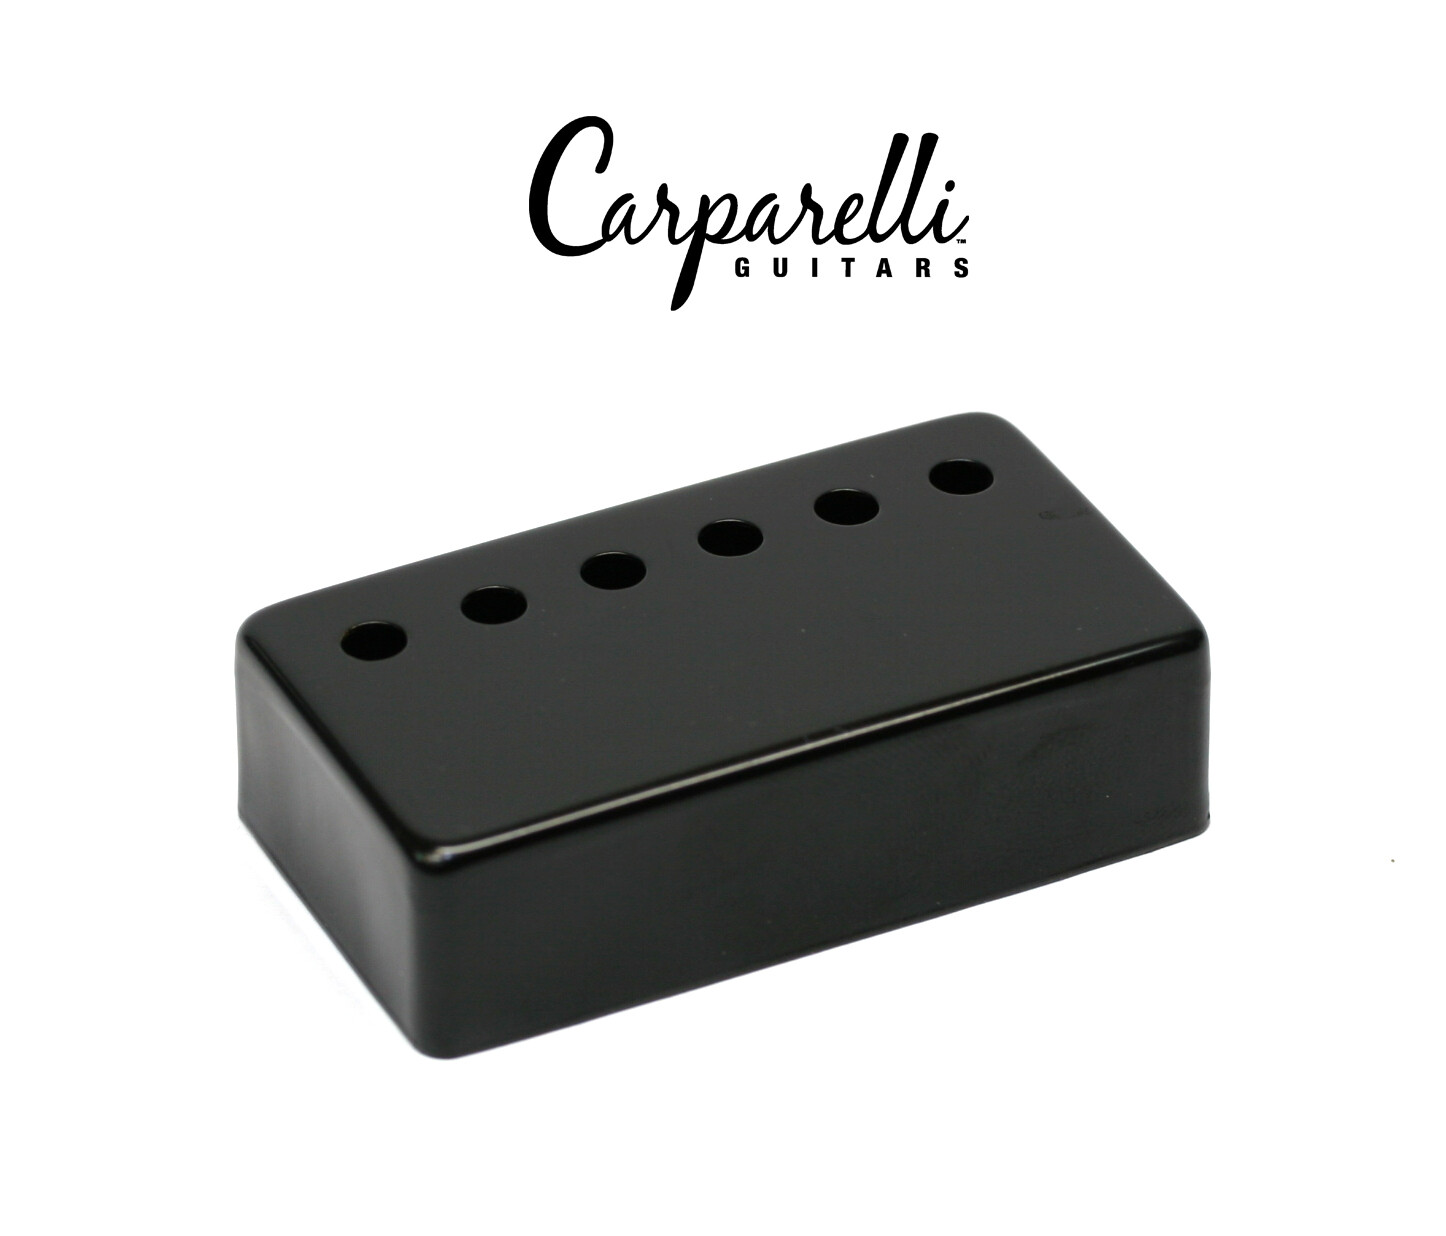 1 Carparelli Metal Humbucker Cover 50mm Black